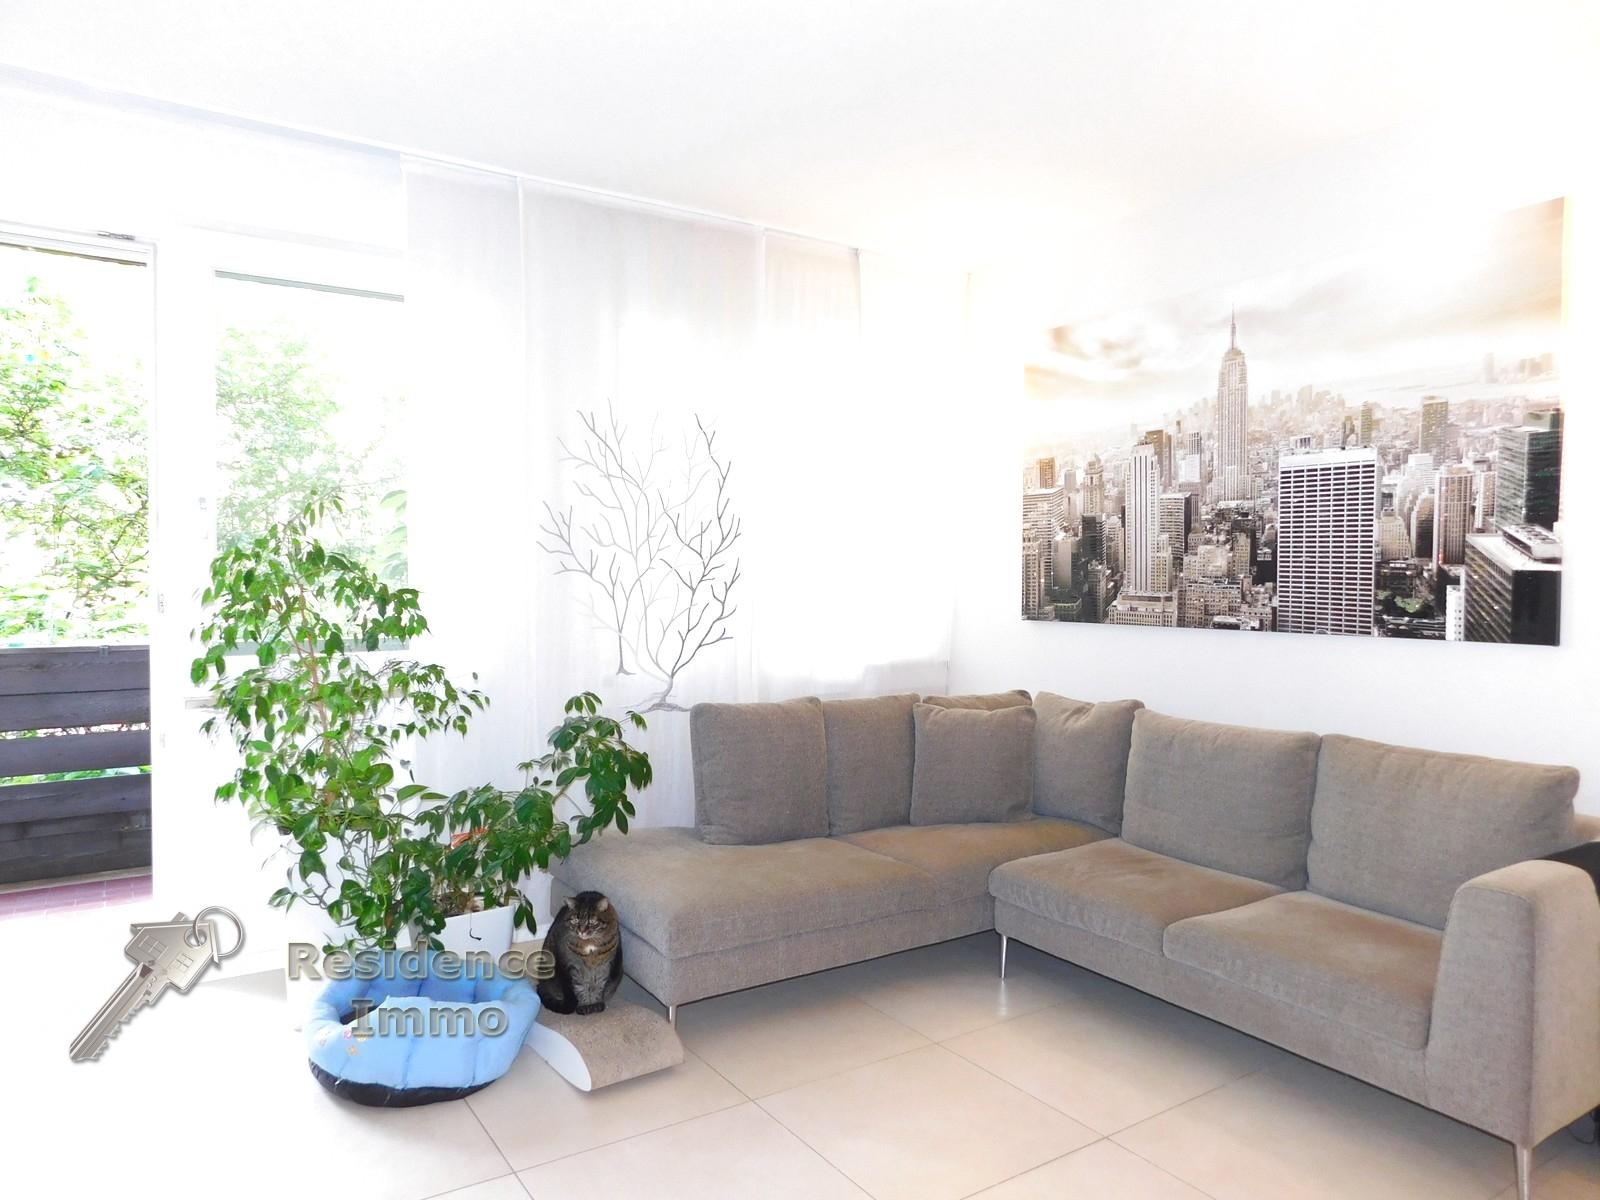 wohnung kaufen in bolzano bozen kodex 2045. Black Bedroom Furniture Sets. Home Design Ideas